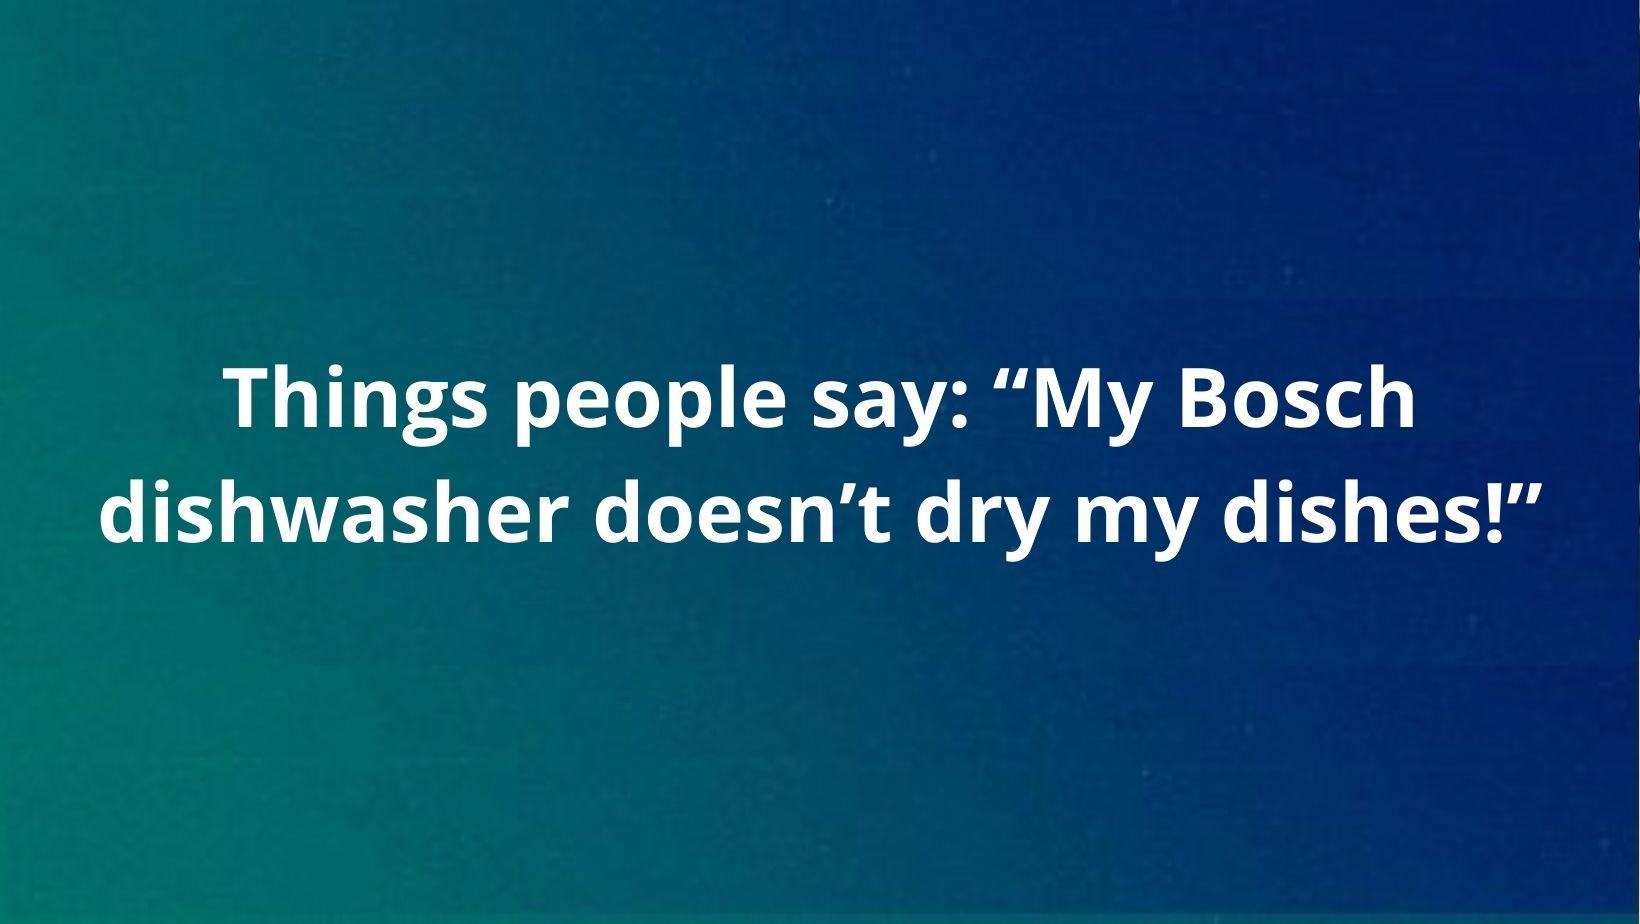 Bosch dishwasher problem resolved